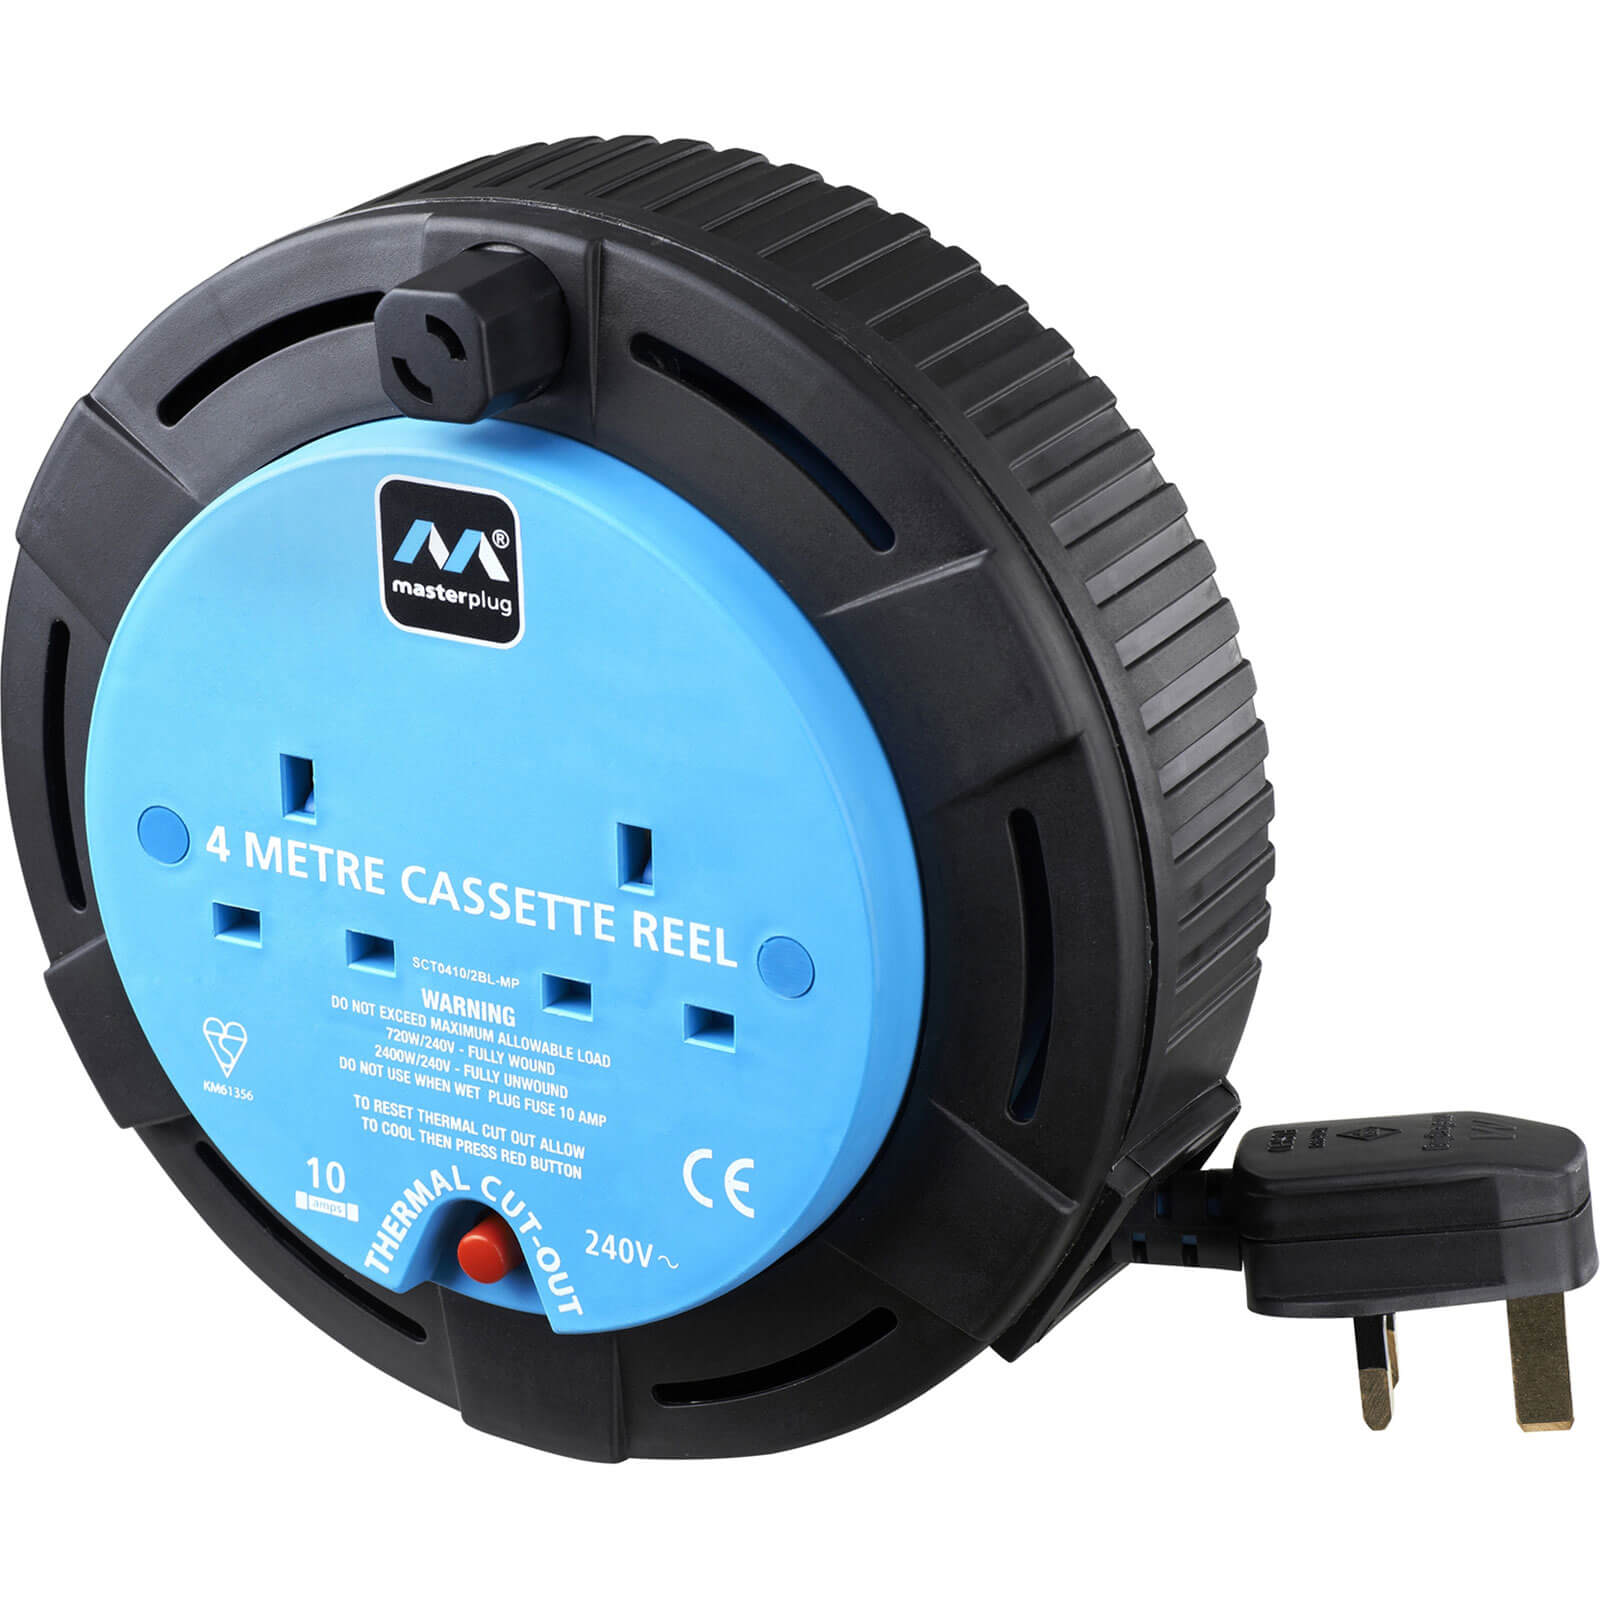 Masterplug 2 Socket 4m Cable Extension Reel 10amp 240v